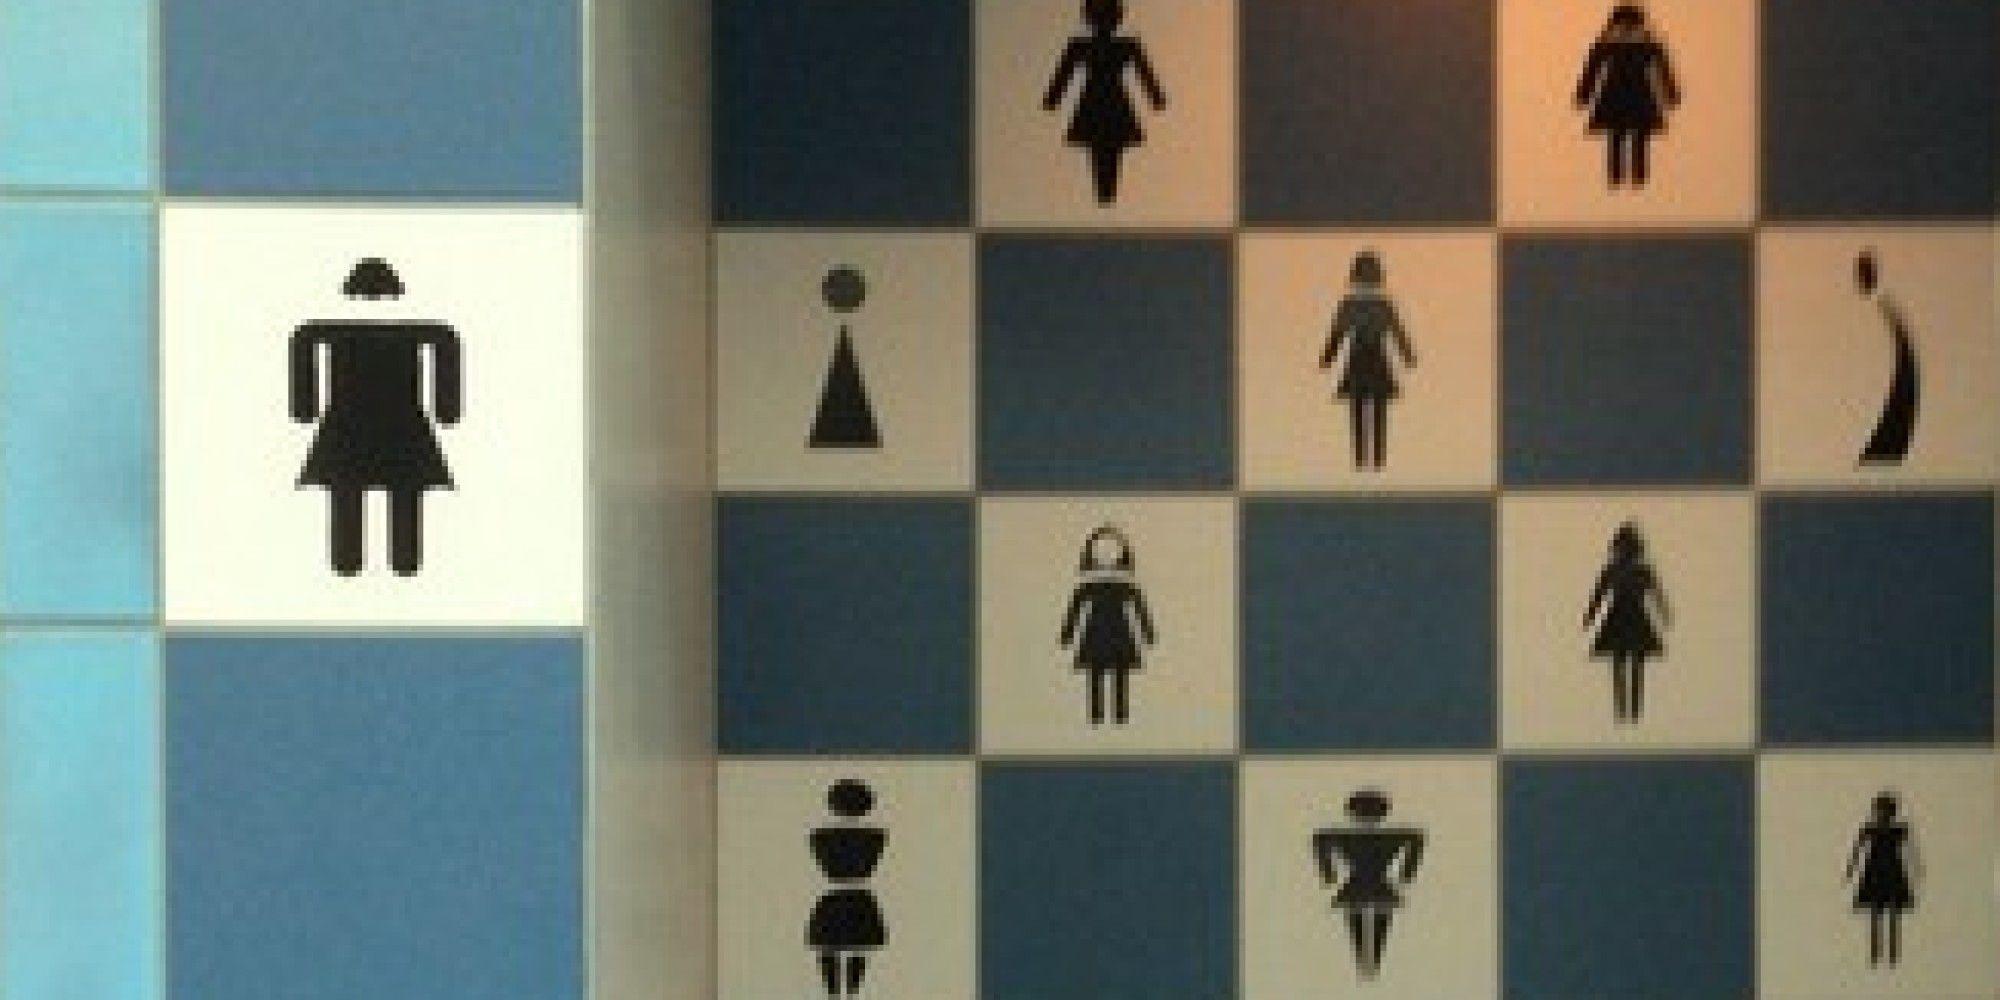 sign creative player womens ad women lesa carolina south bathroom s work